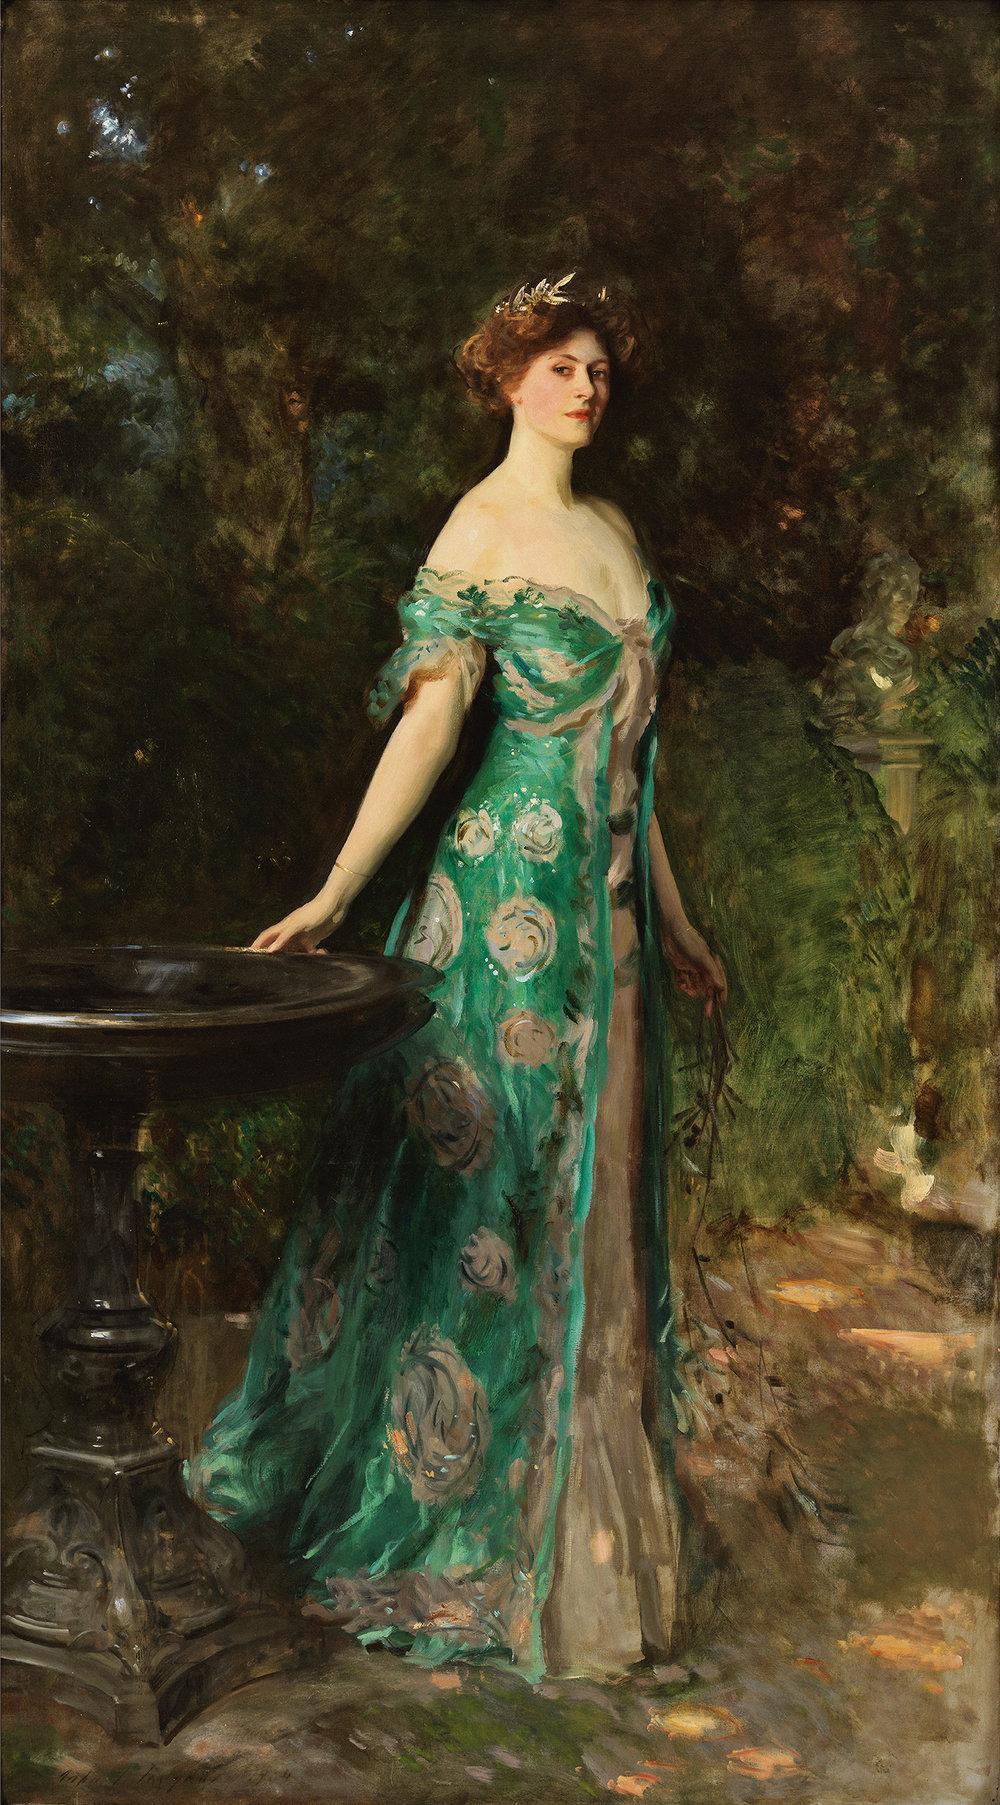 Retrato de Milicent, duquesa de Sutherland. 1904 · John Singer Sargent. © Museo Thyssen-Bornemisza, Madrid